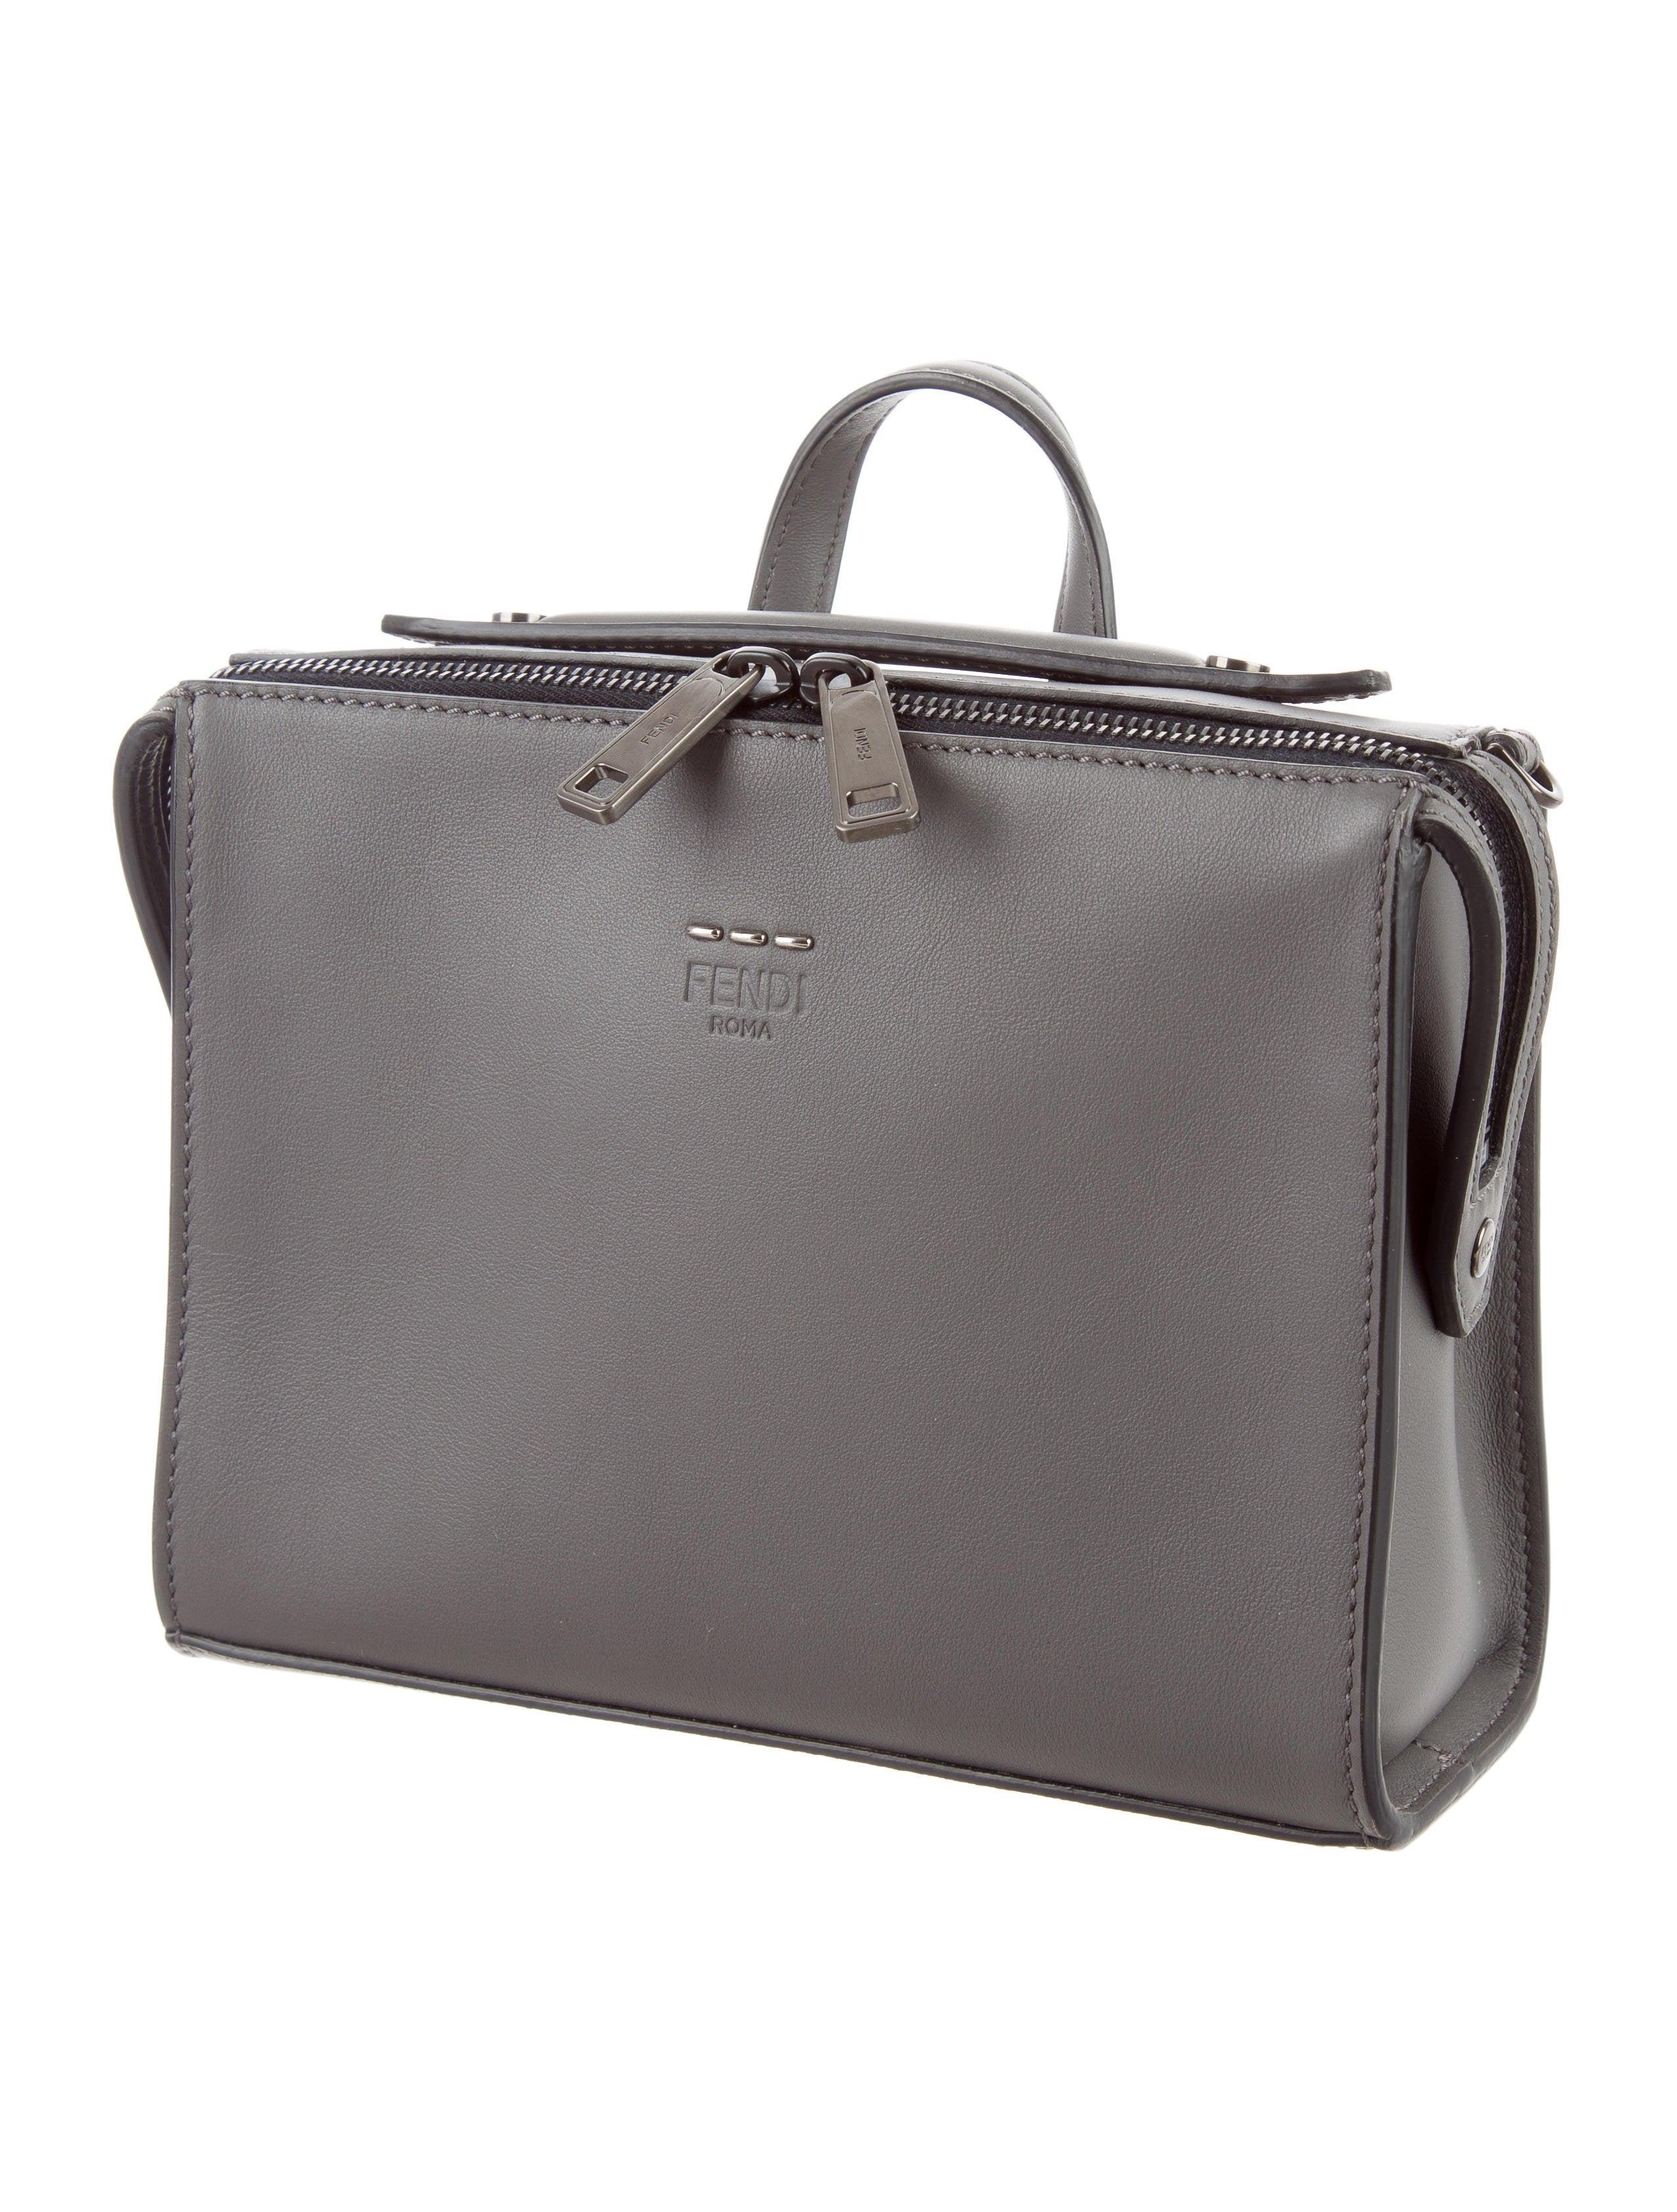 303345554a Fendi Mini Leather Messenger Bag - Bags - FEN55489